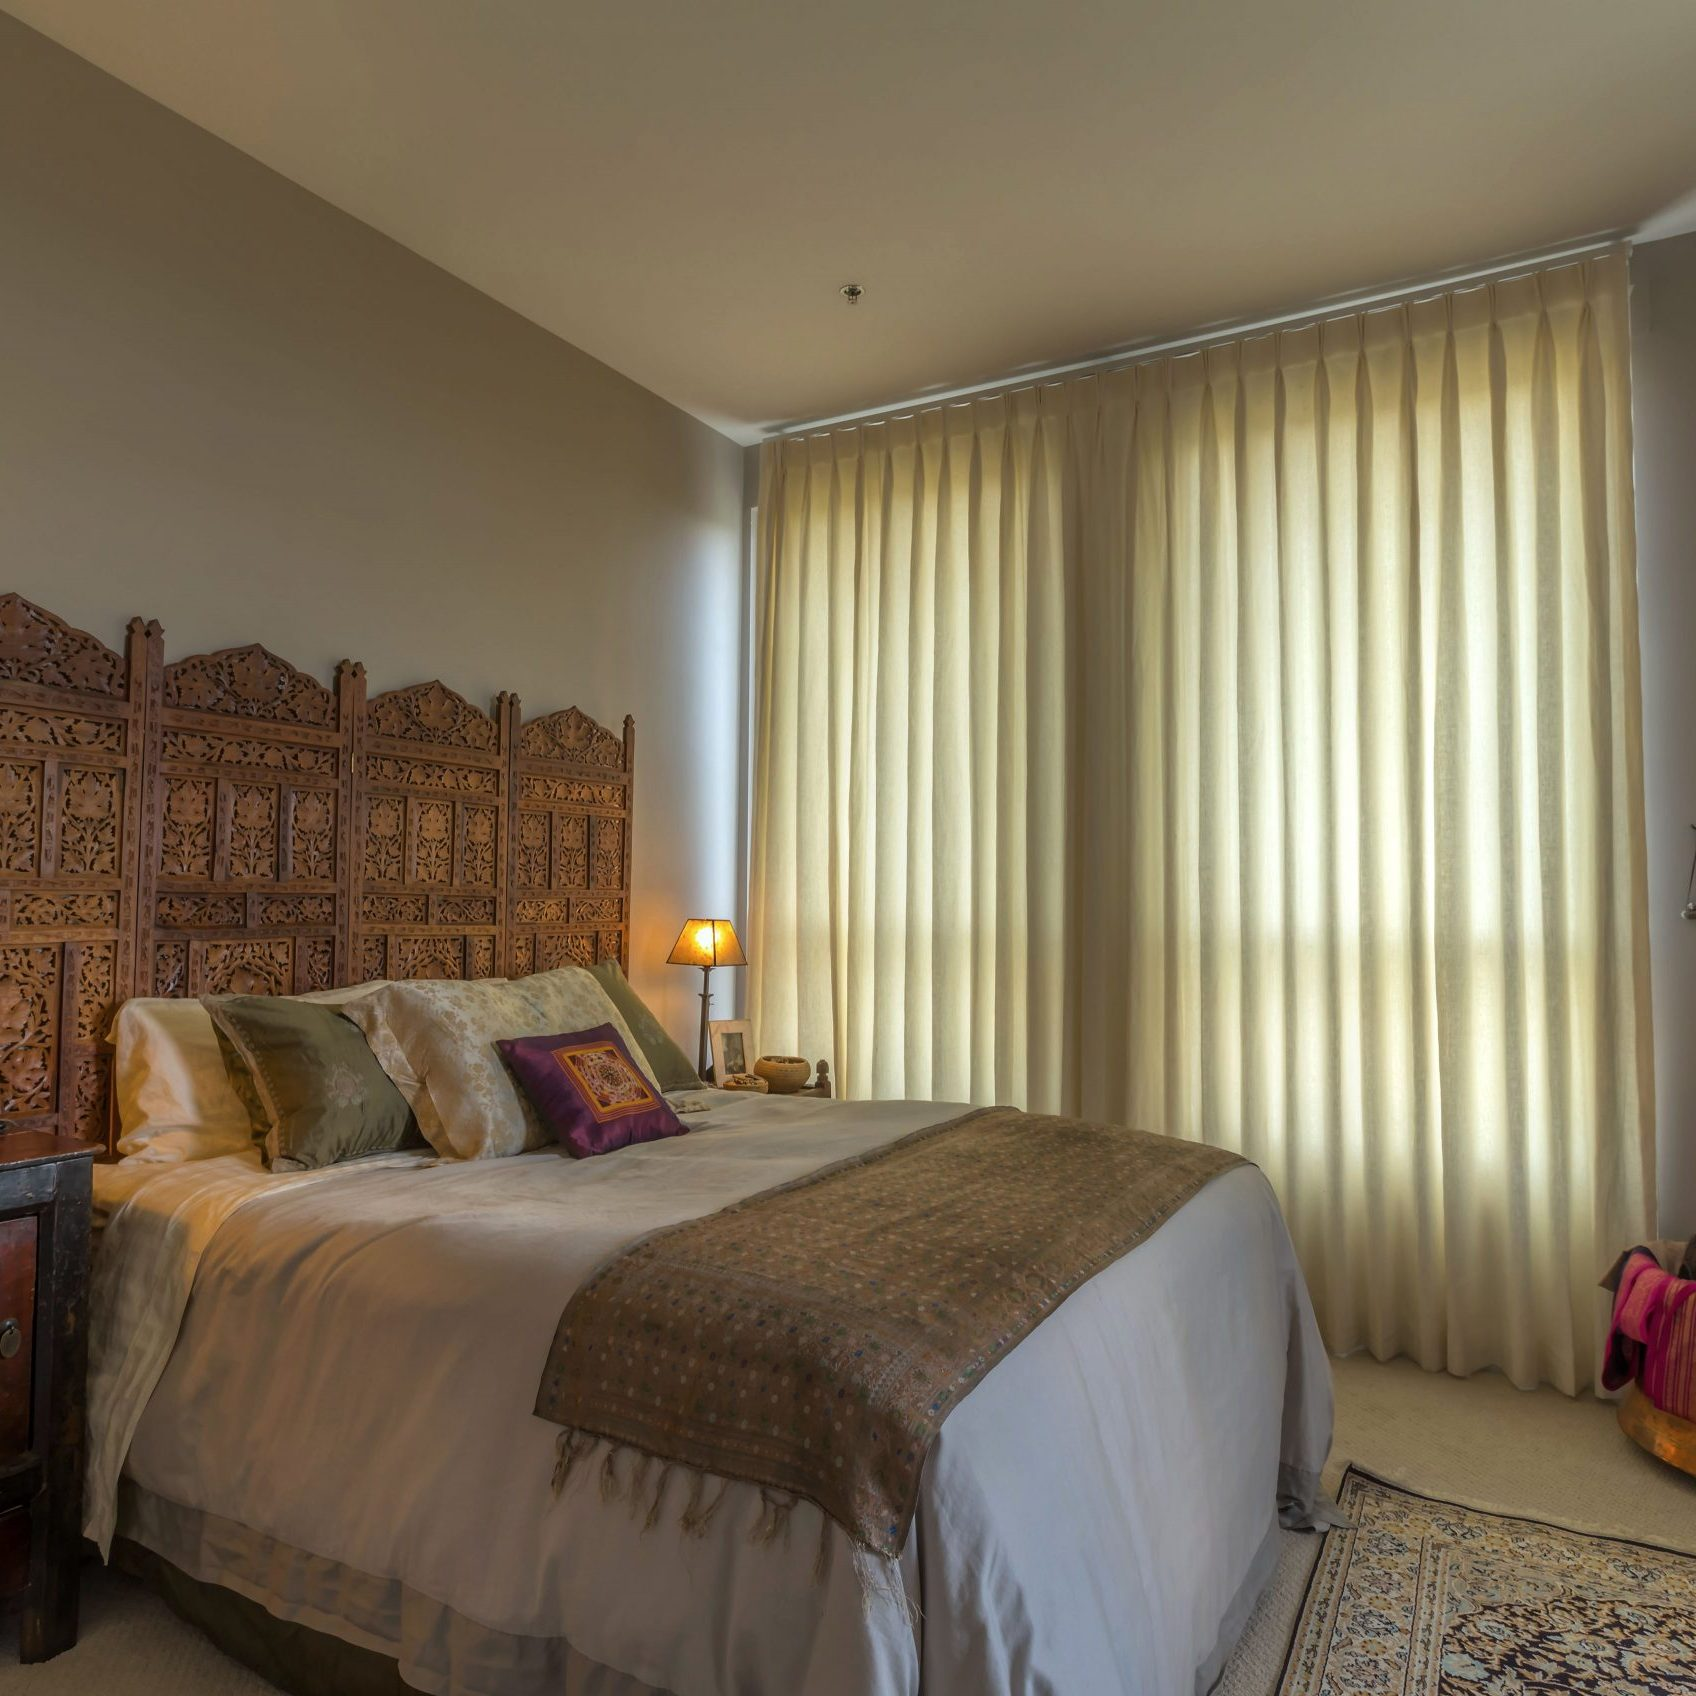 Bedroom Integral Design Consultant Lorell Frysh of Buckhead, Atlanta, GA